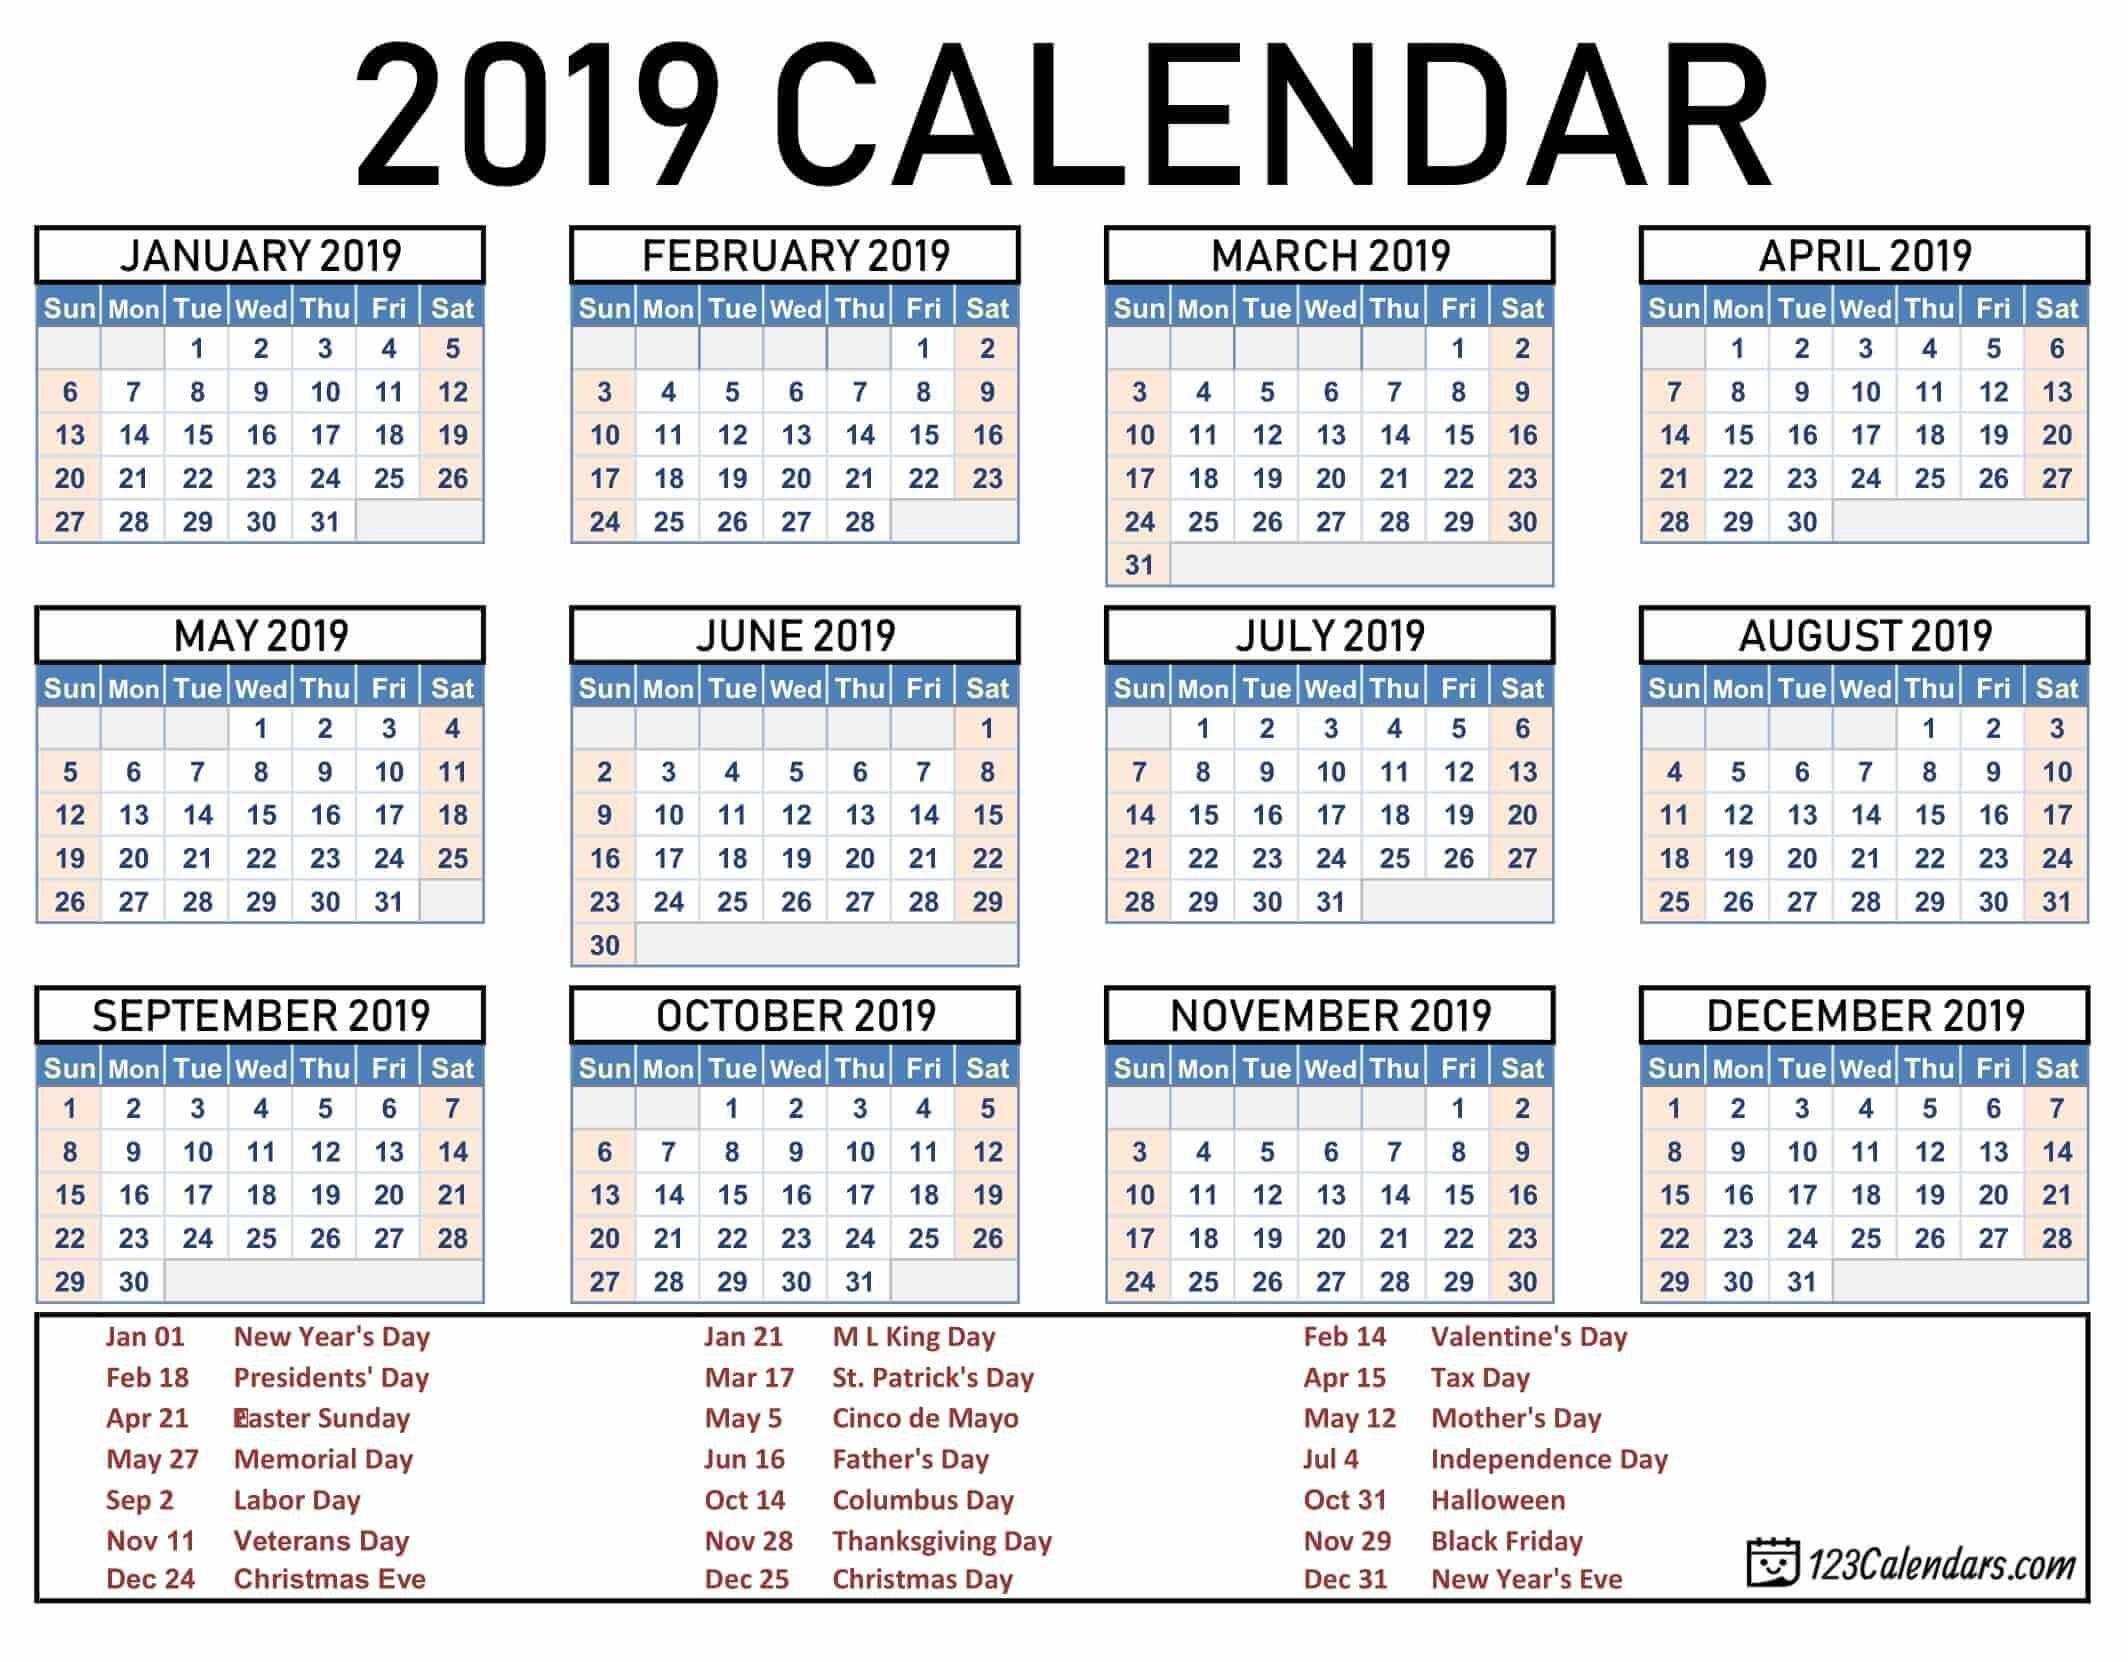 Year 2019 Printable Calendar Templates - 123Calendars Calendar Of 2019